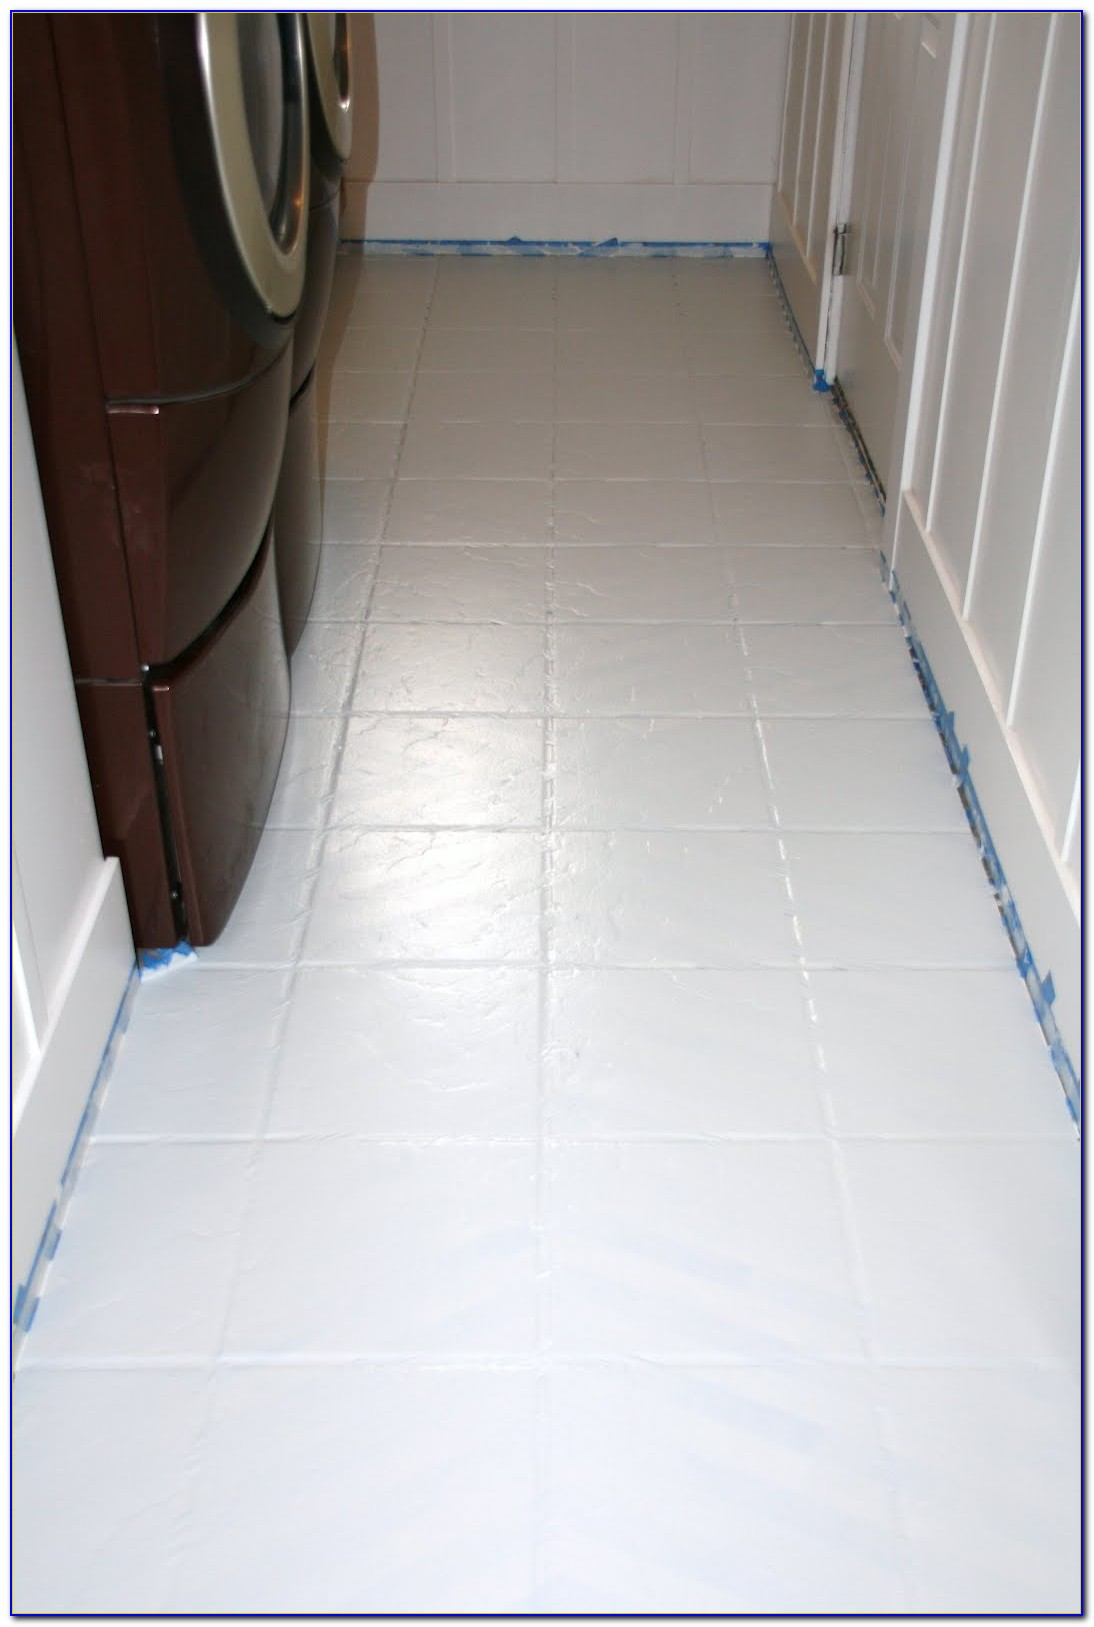 Epoxy Paint For Tile Floor